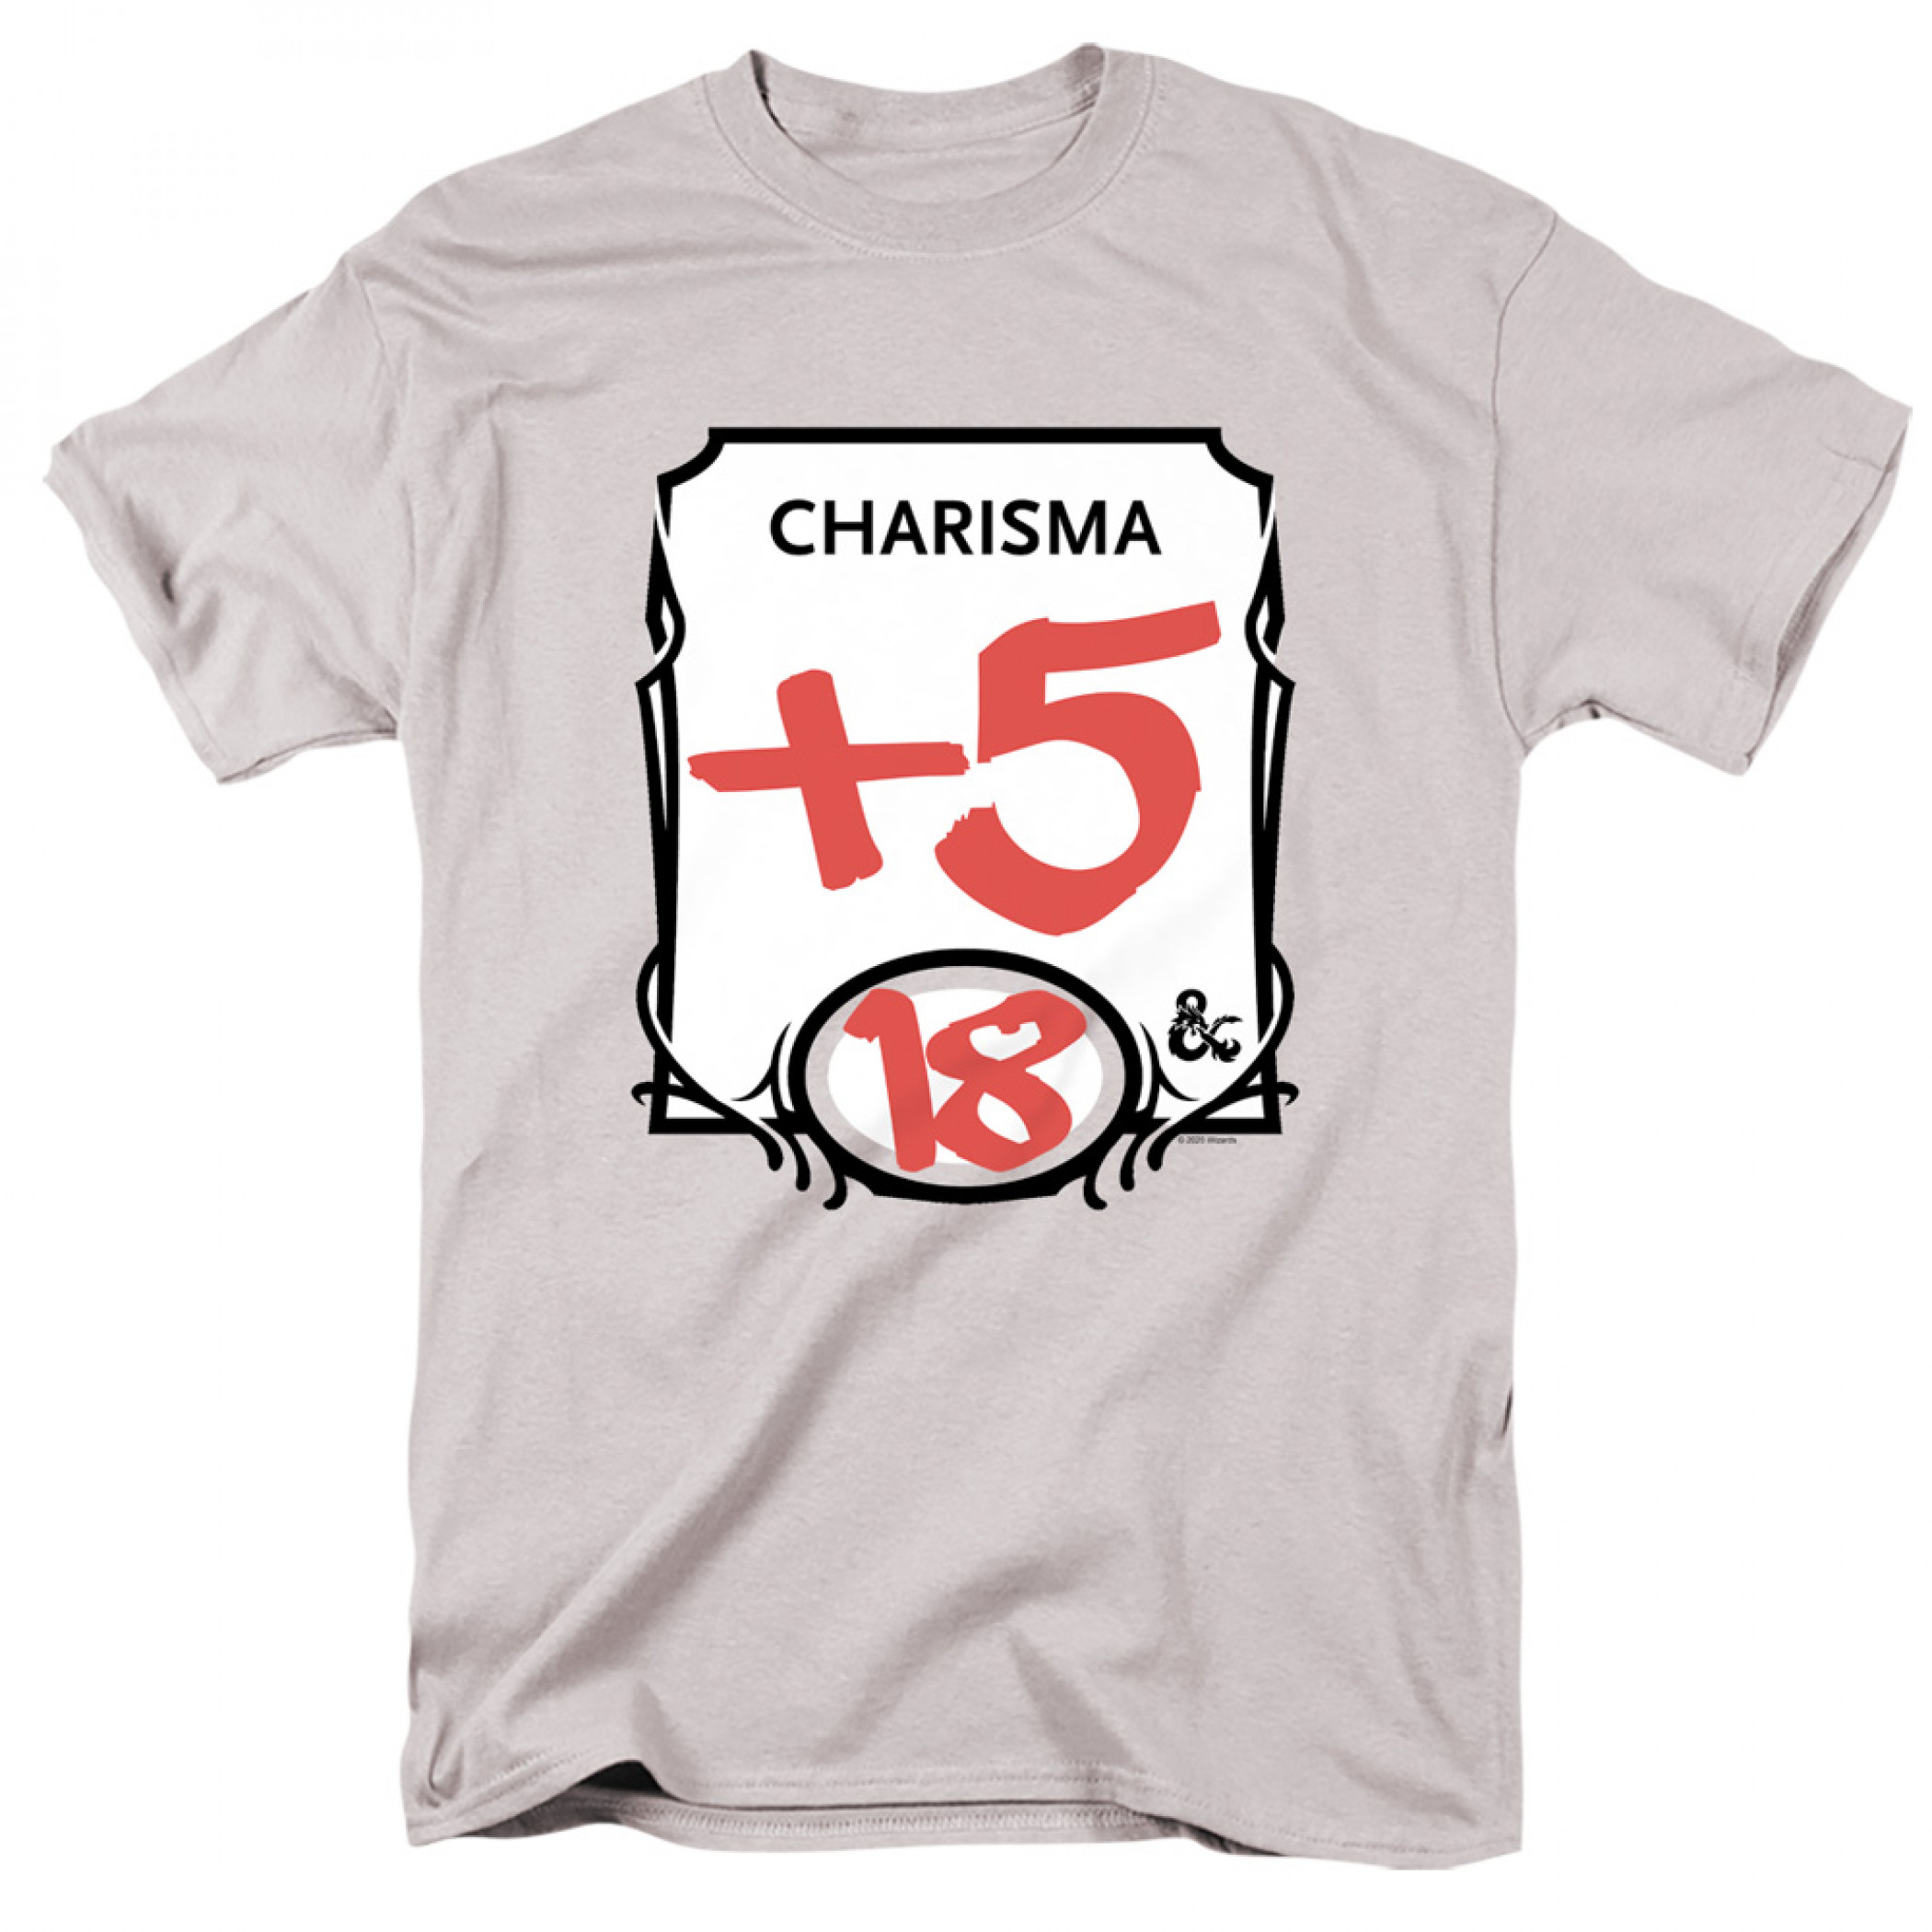 Dungeons & Dragons +5 Charisma T-Shirt